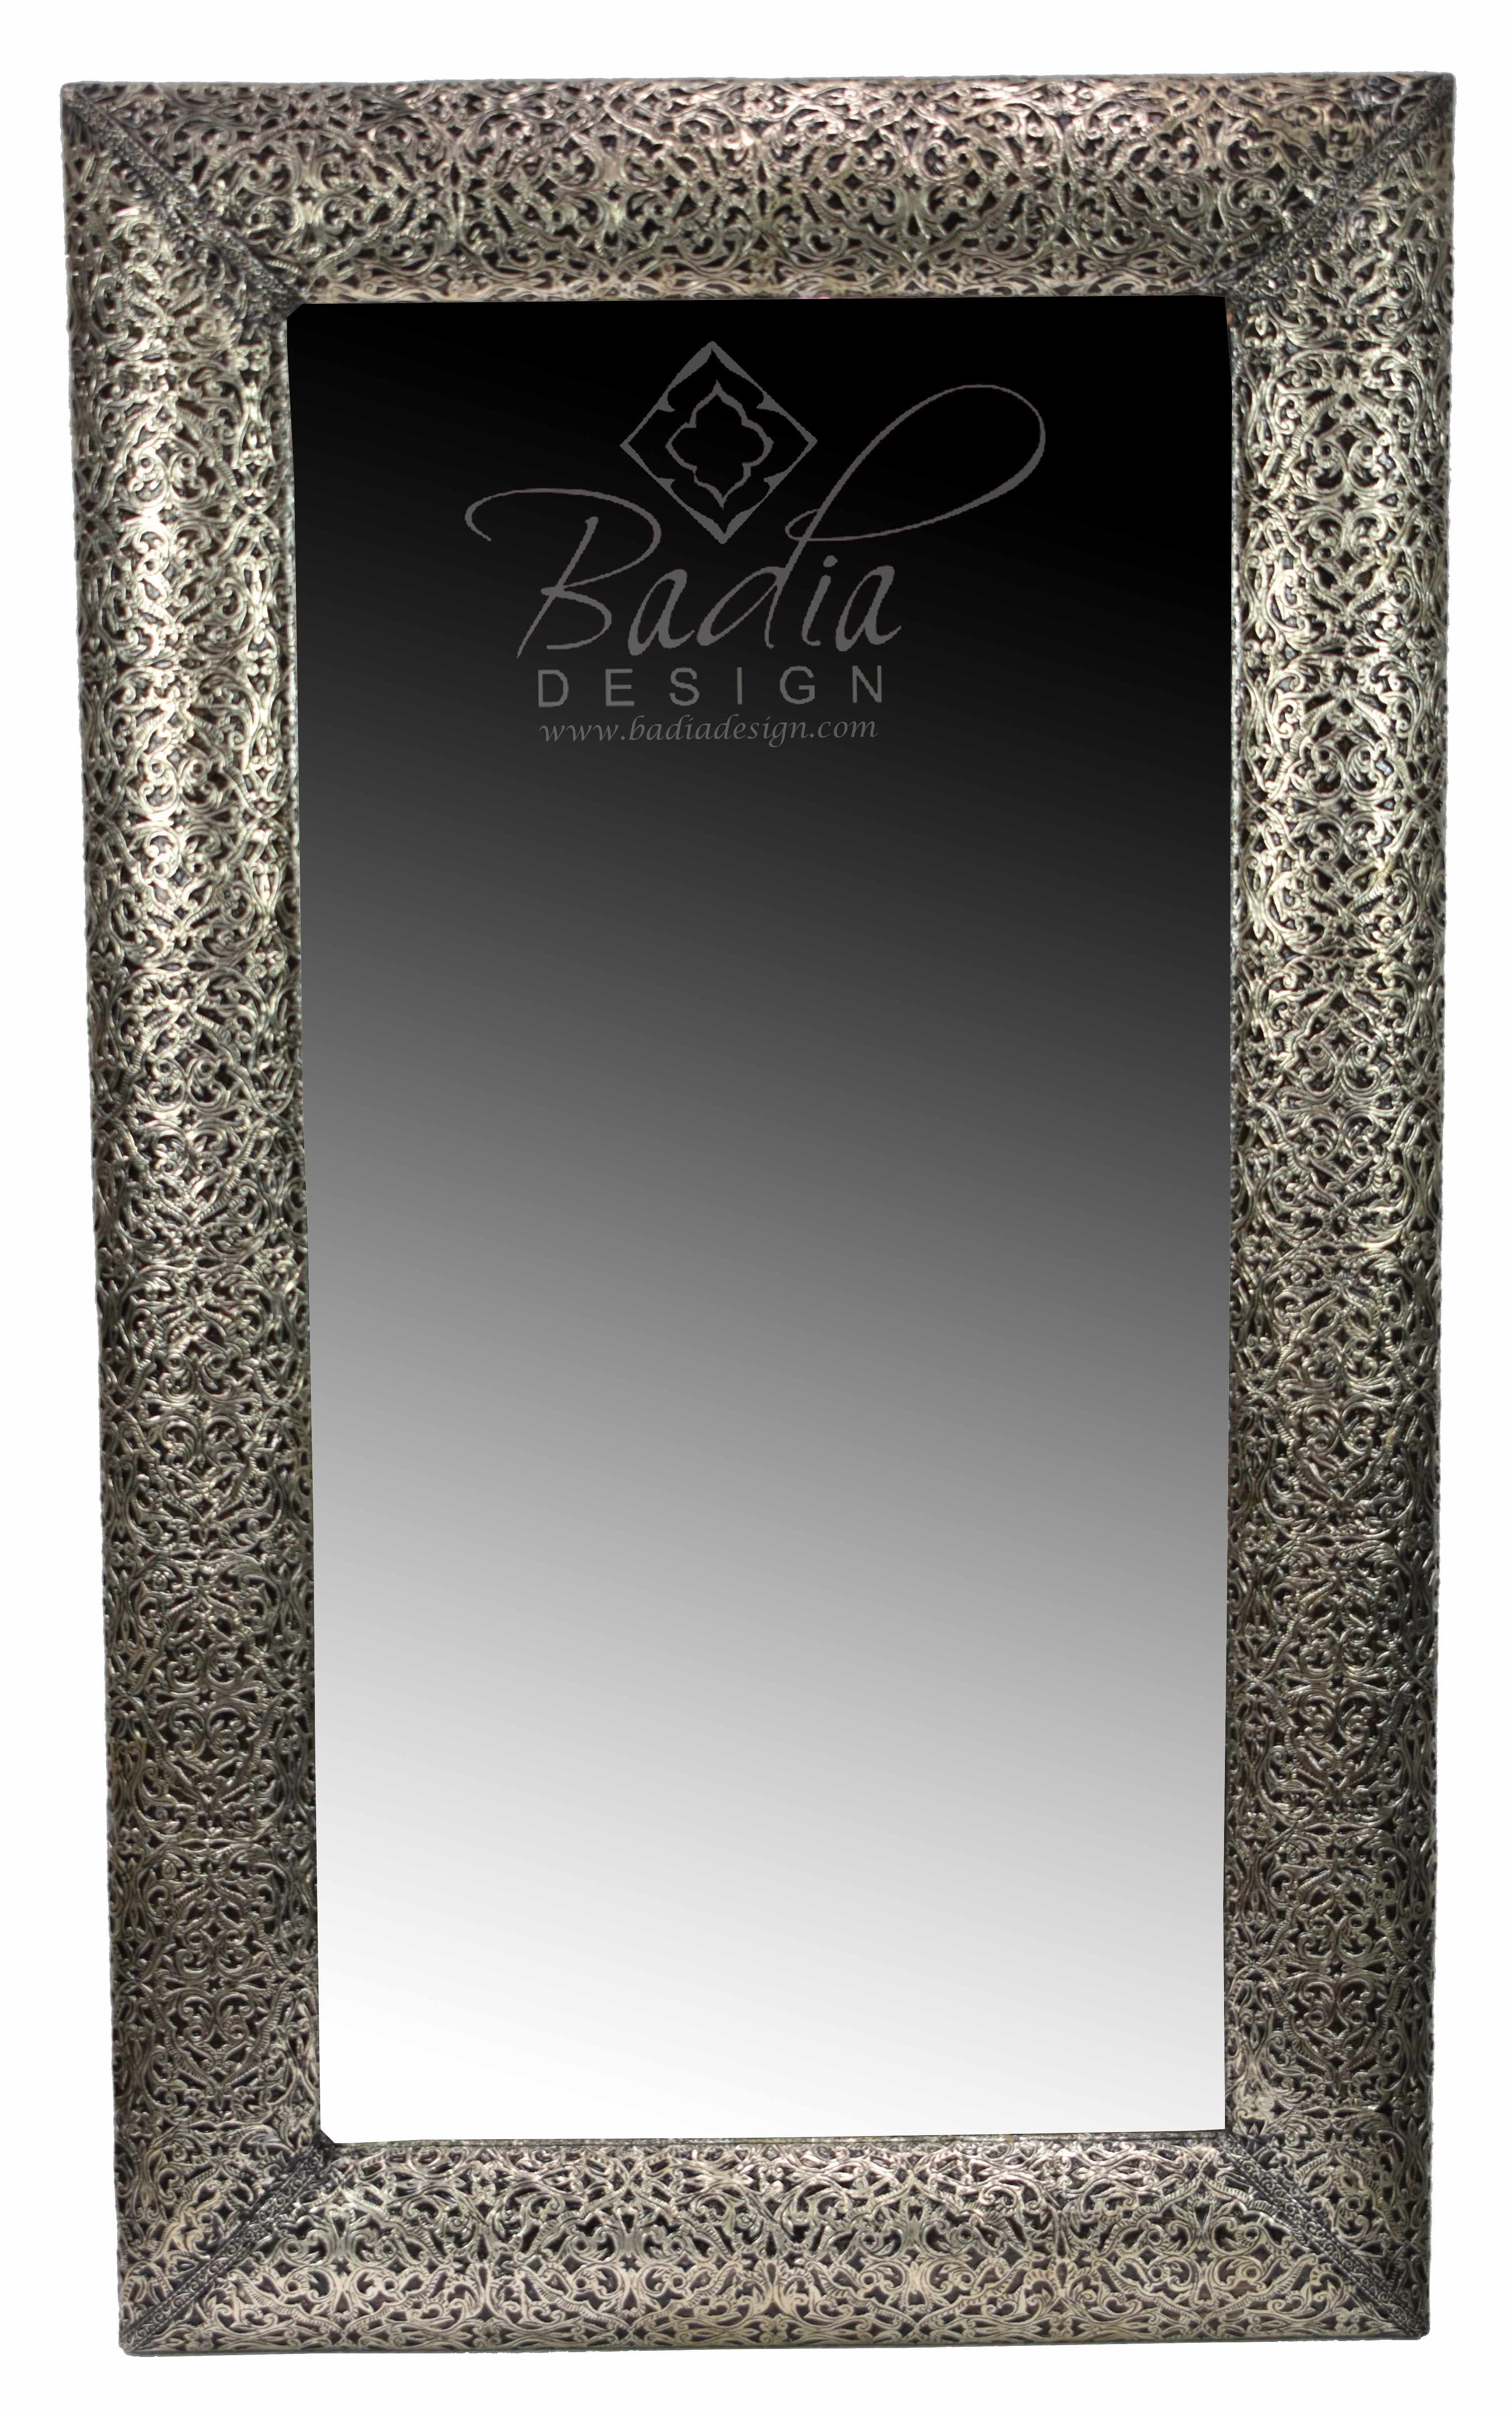 moroccan-rectangular-shaped-embossed-silver-nickel-mirror-m-em018.jpg